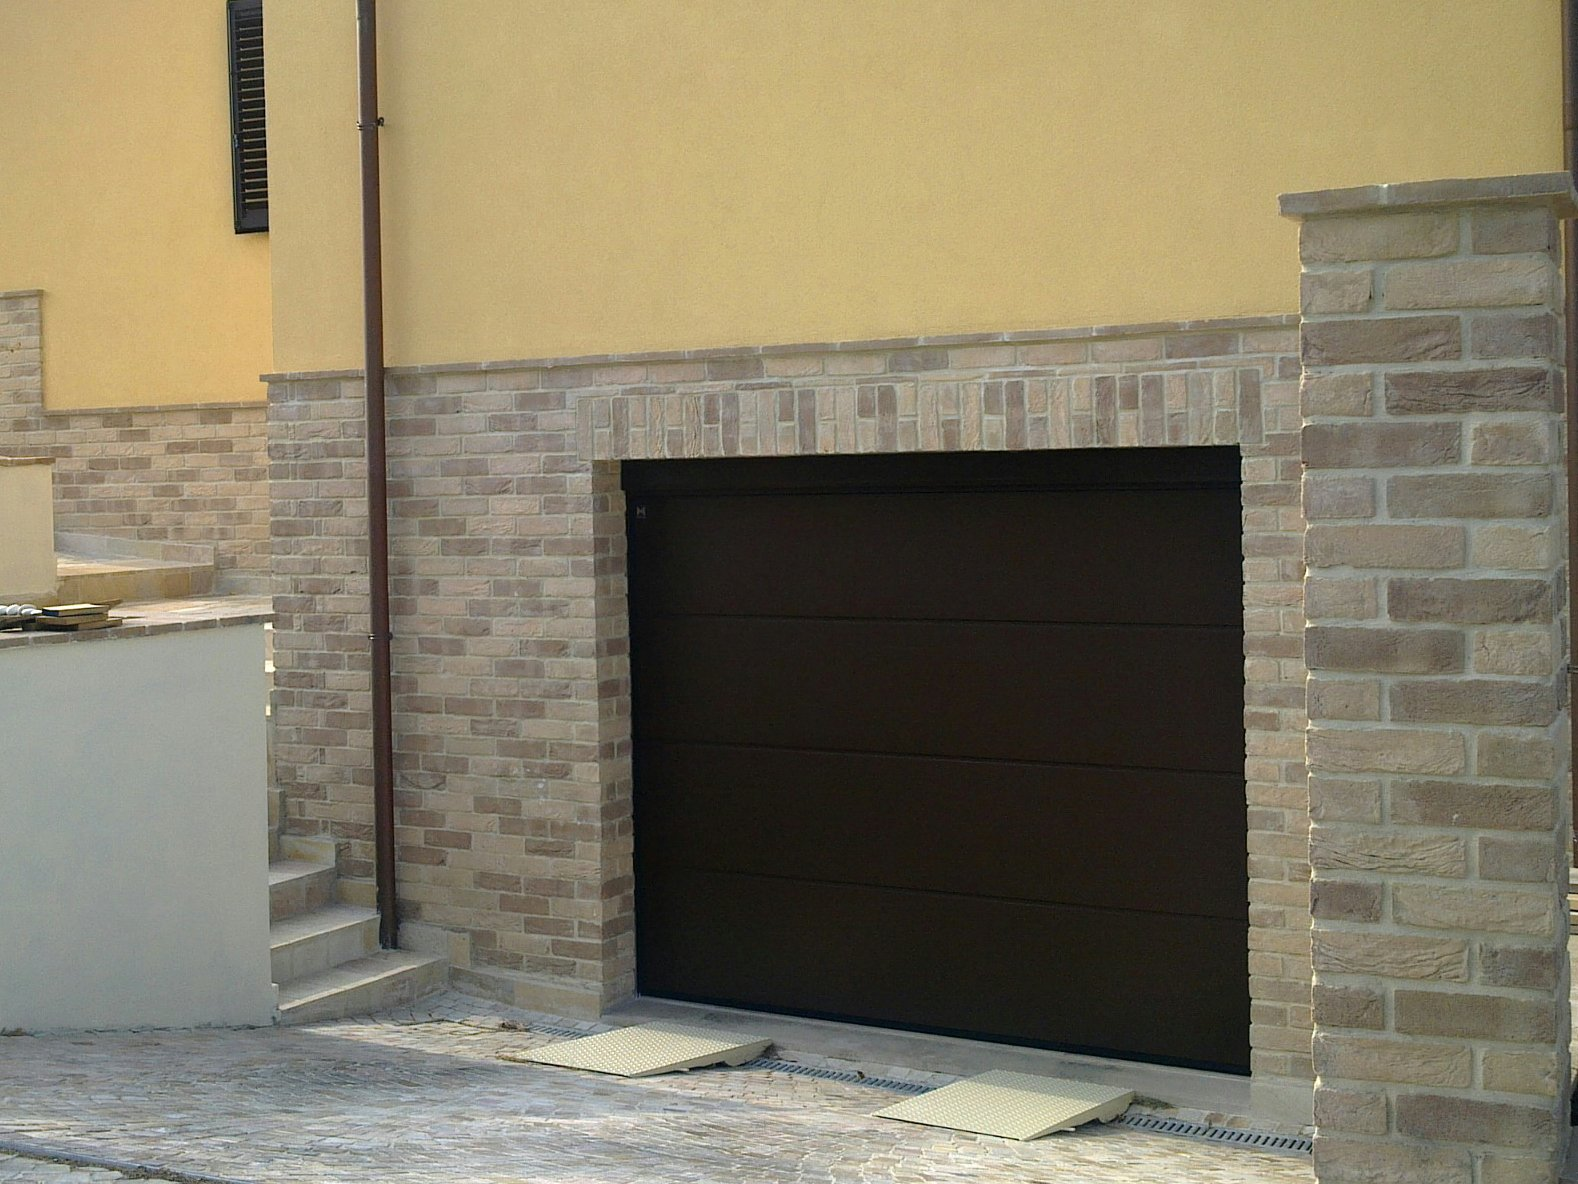 Epu 40 porte de garage by h rmann italia for Porte de garage sectionnelle hormann renomatic